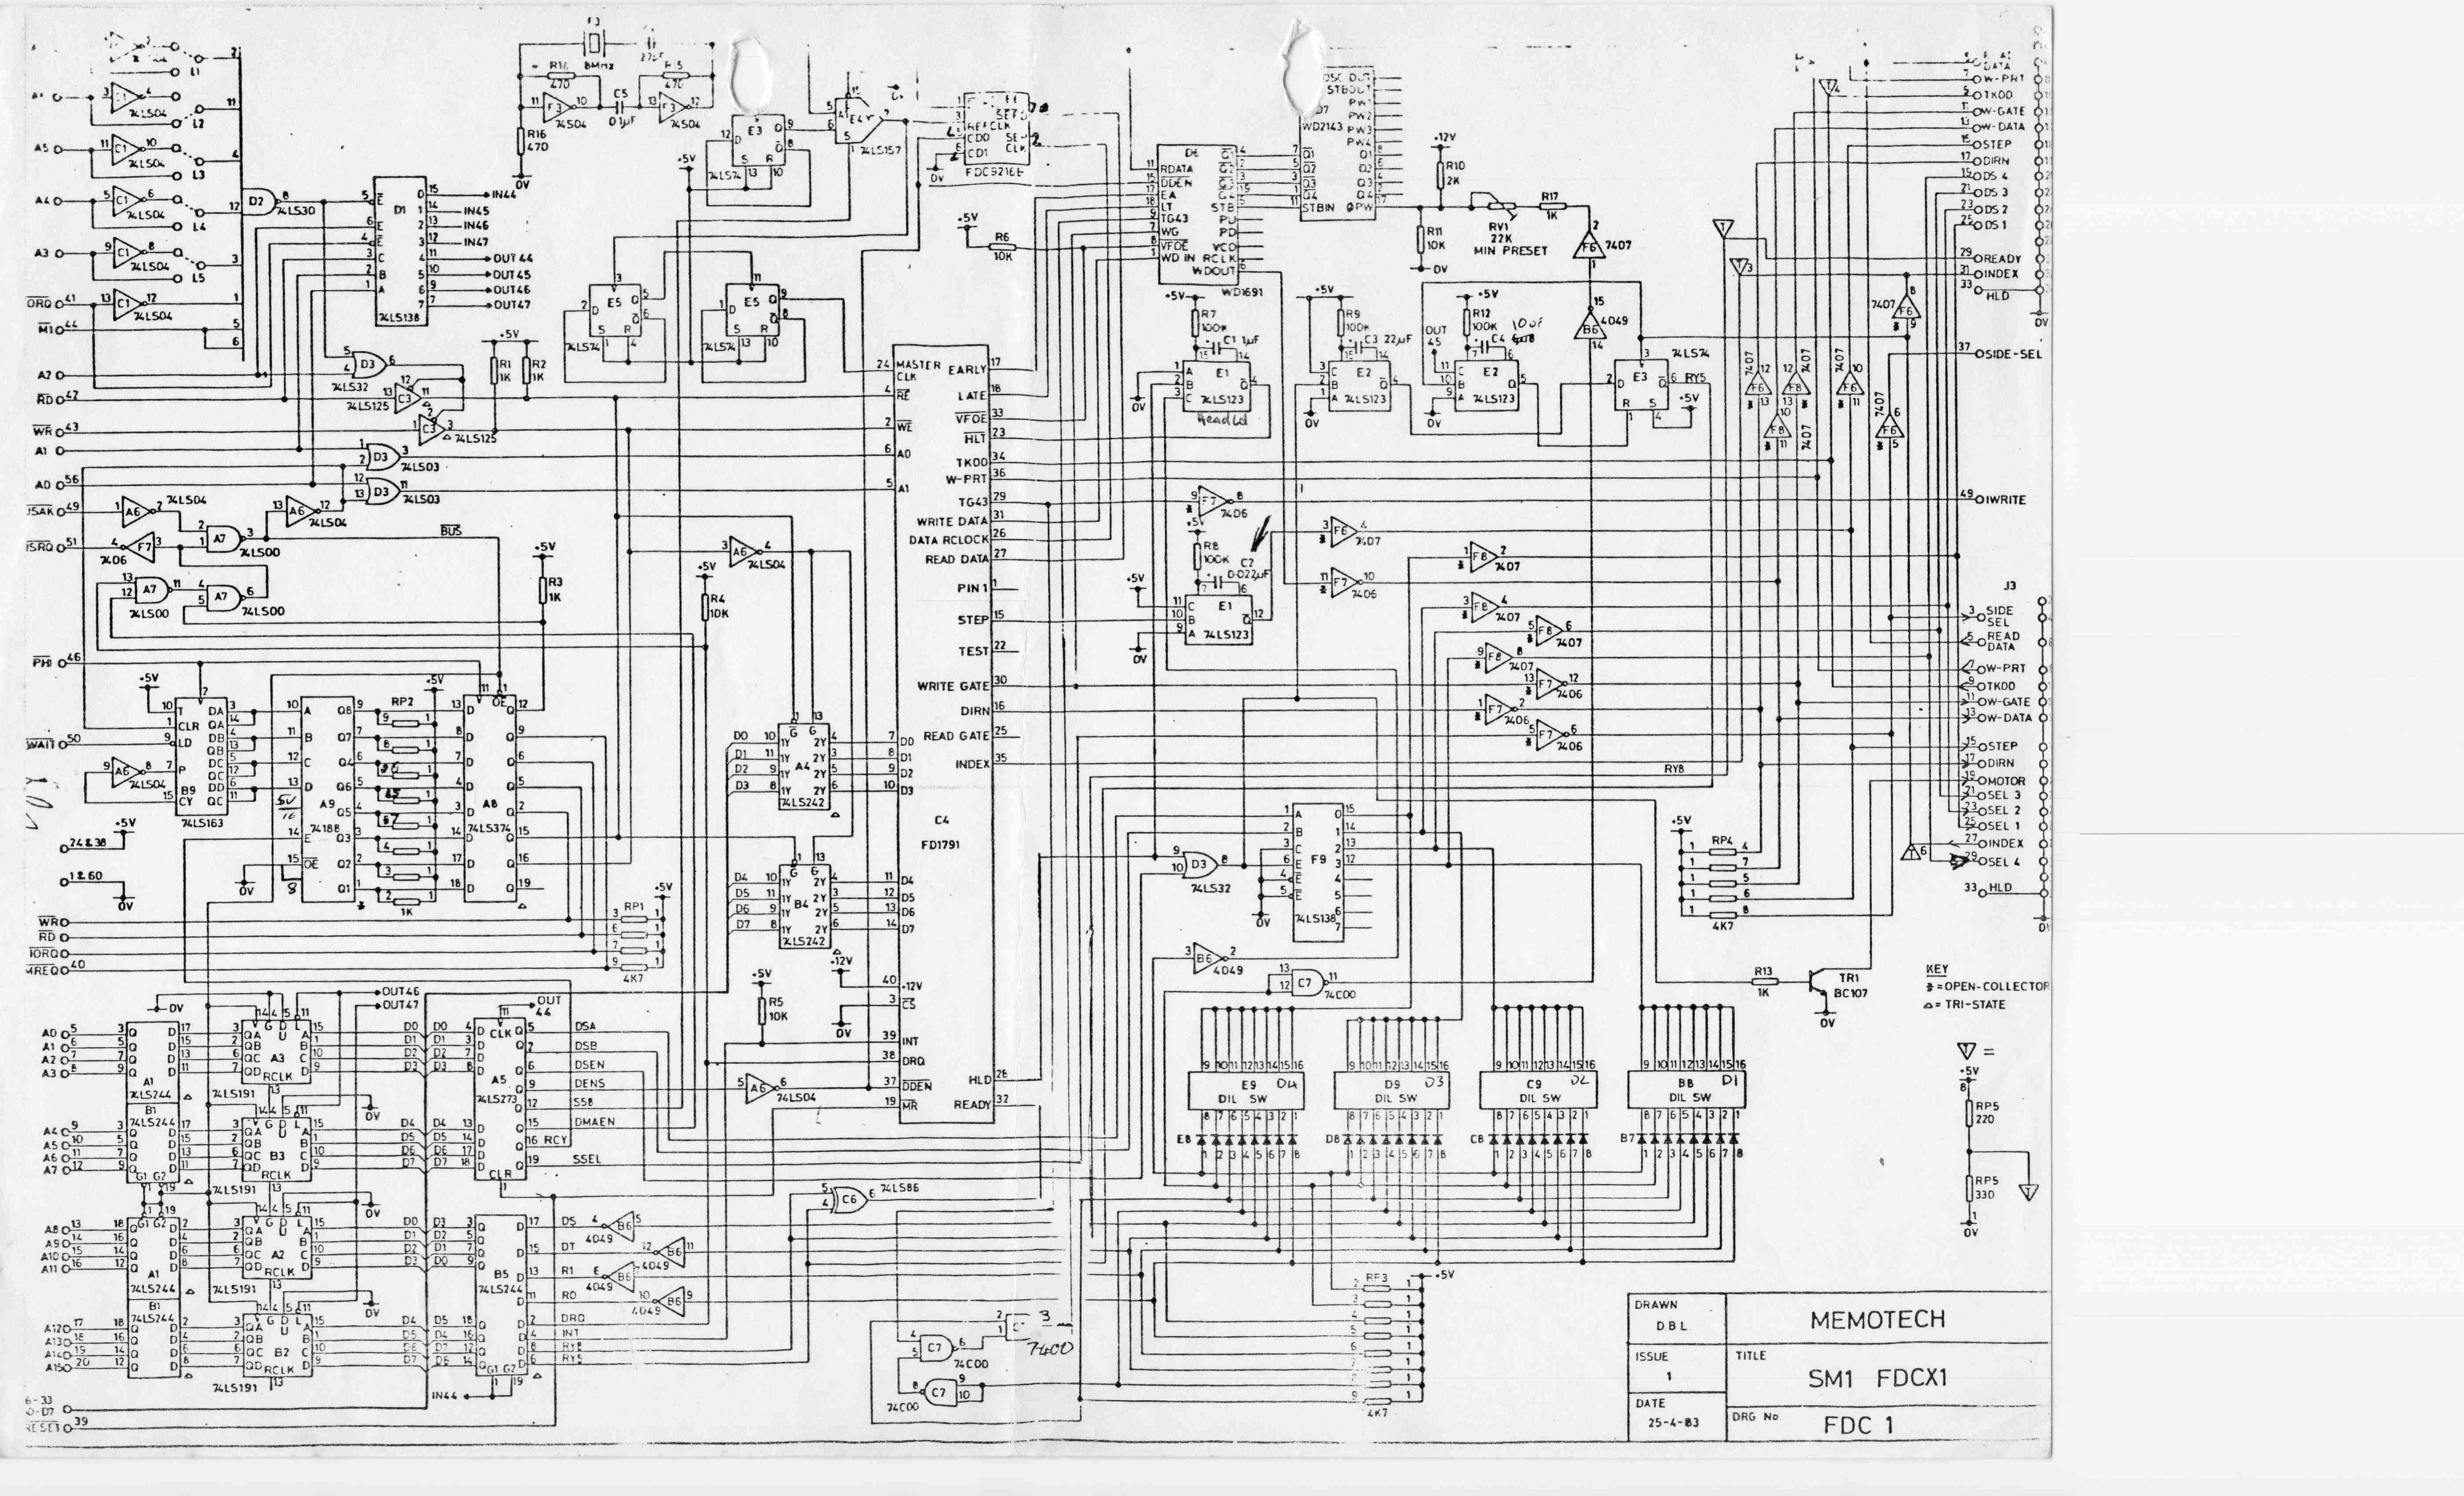 Memotech Mtx 512 Manuals Click For Full Schematic Diagram